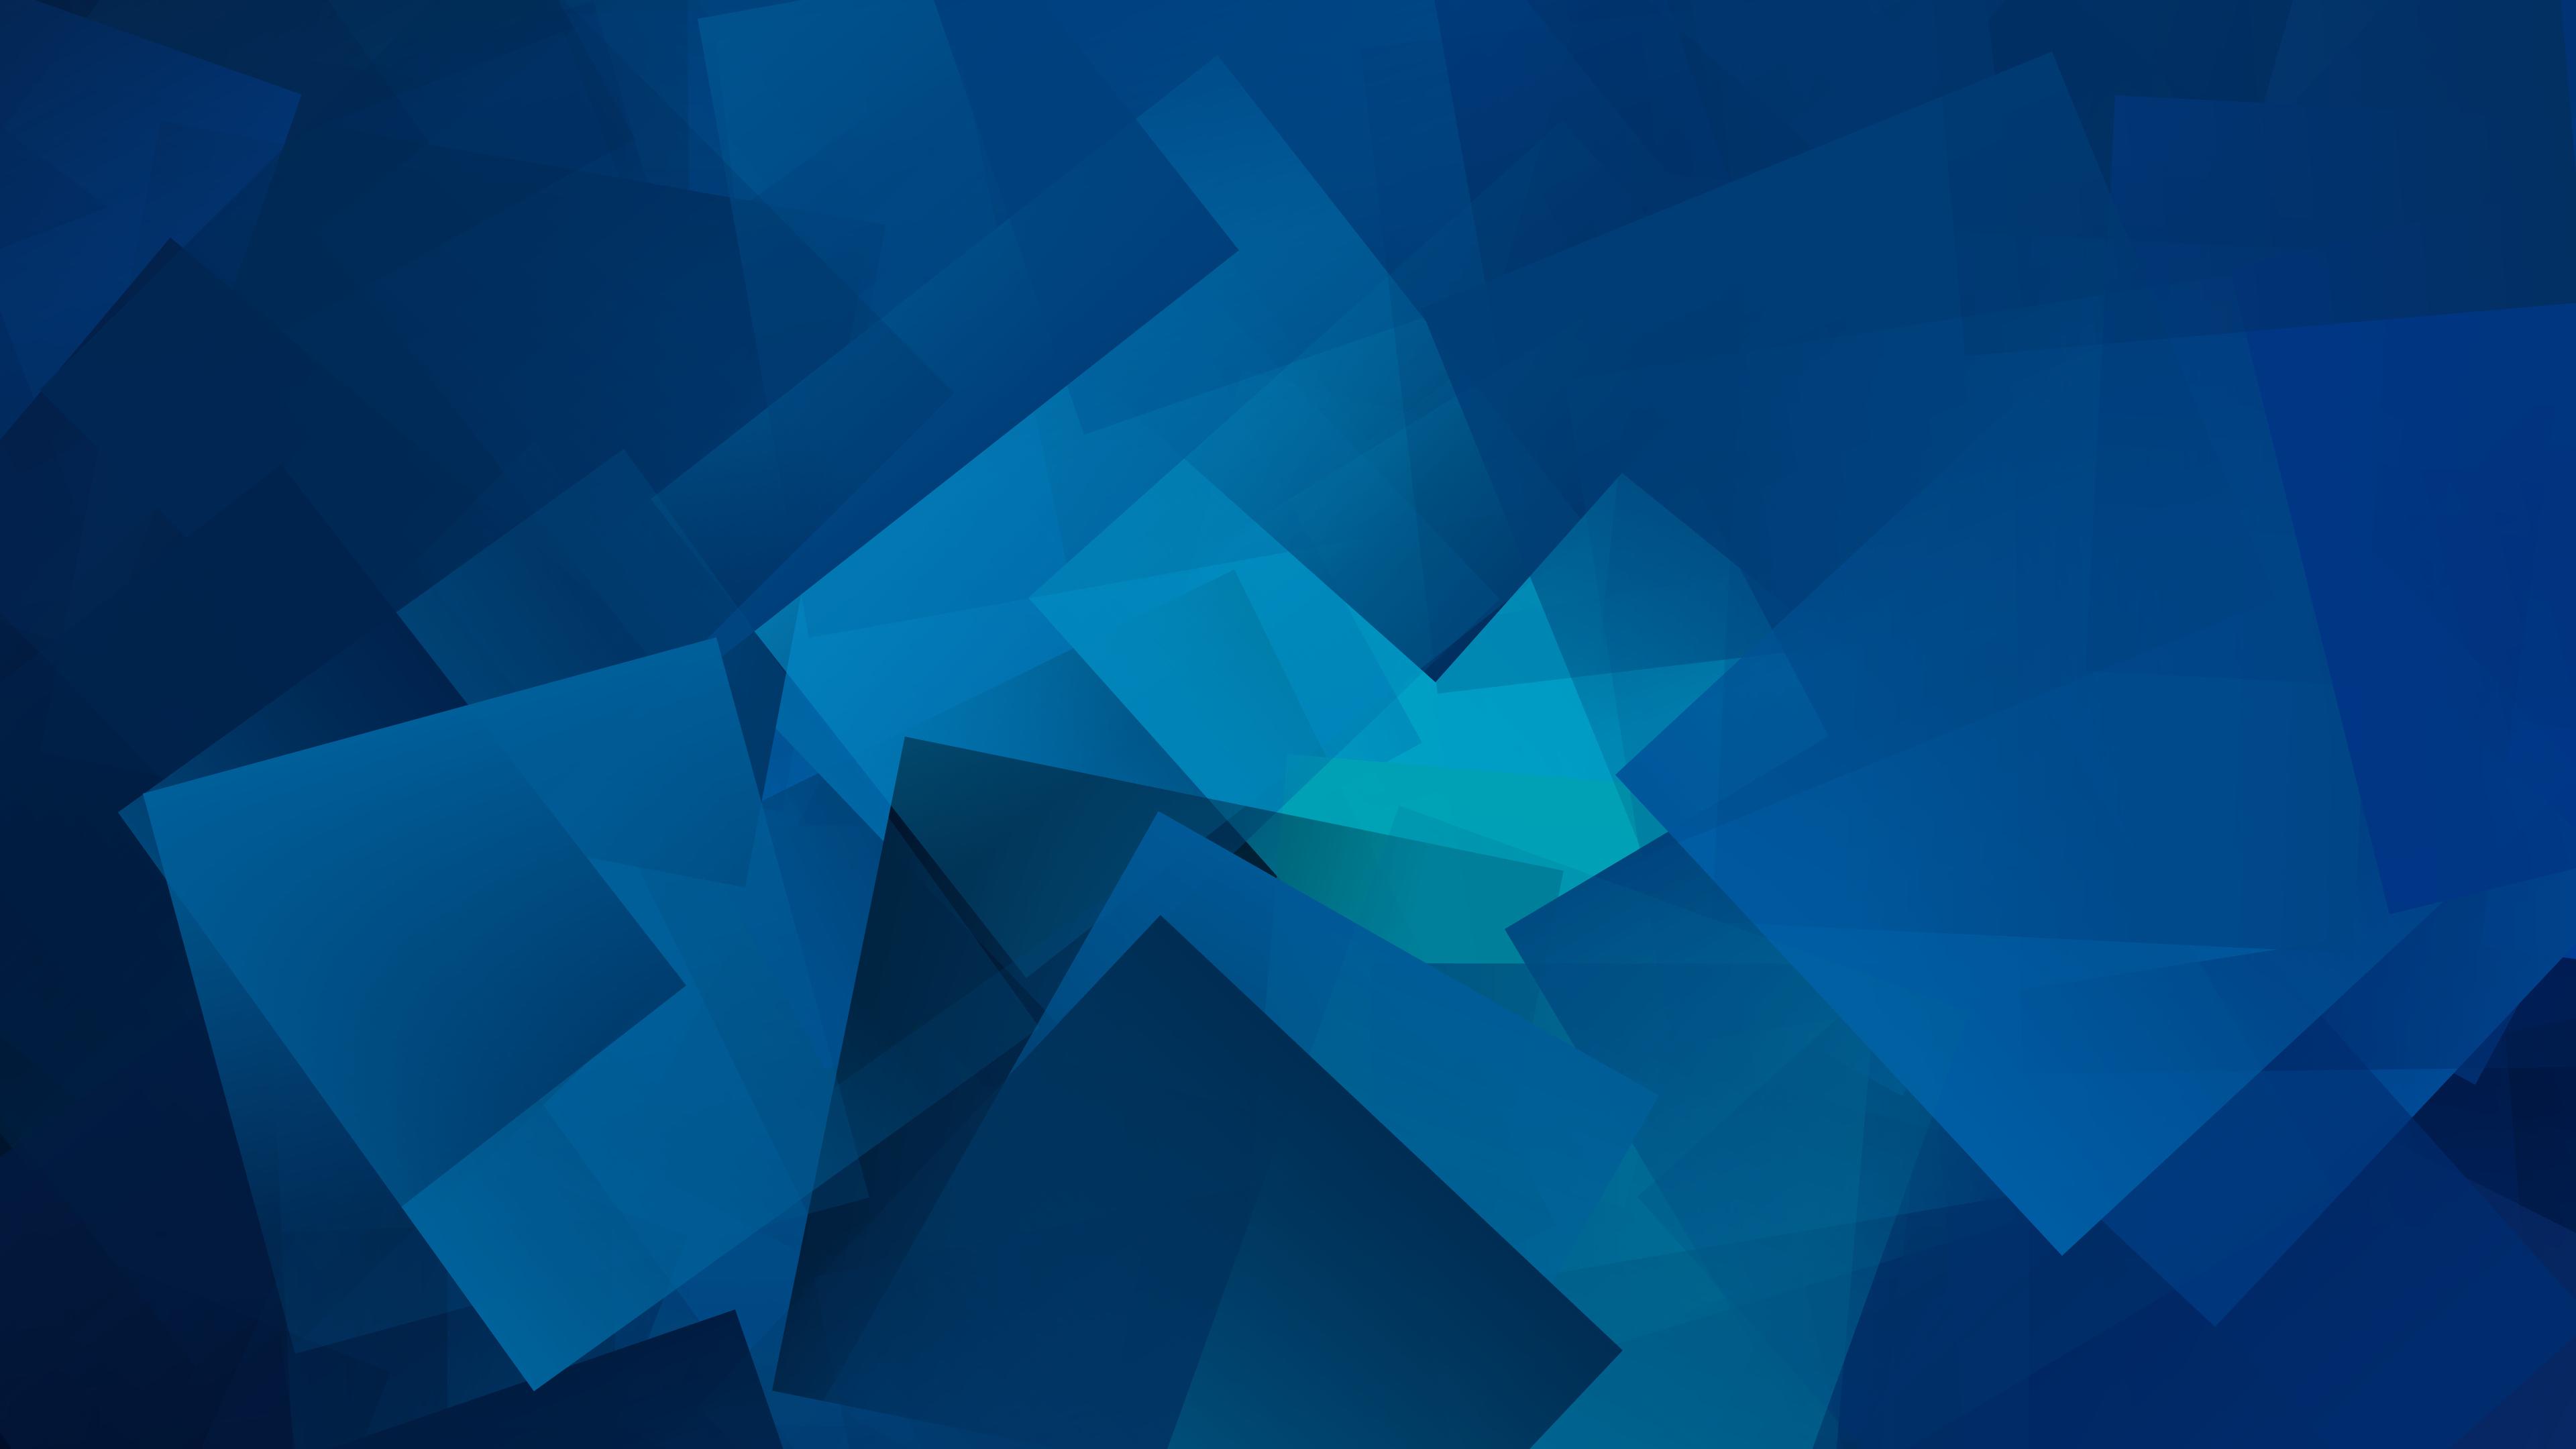 Cube Geometry Gradient 4k